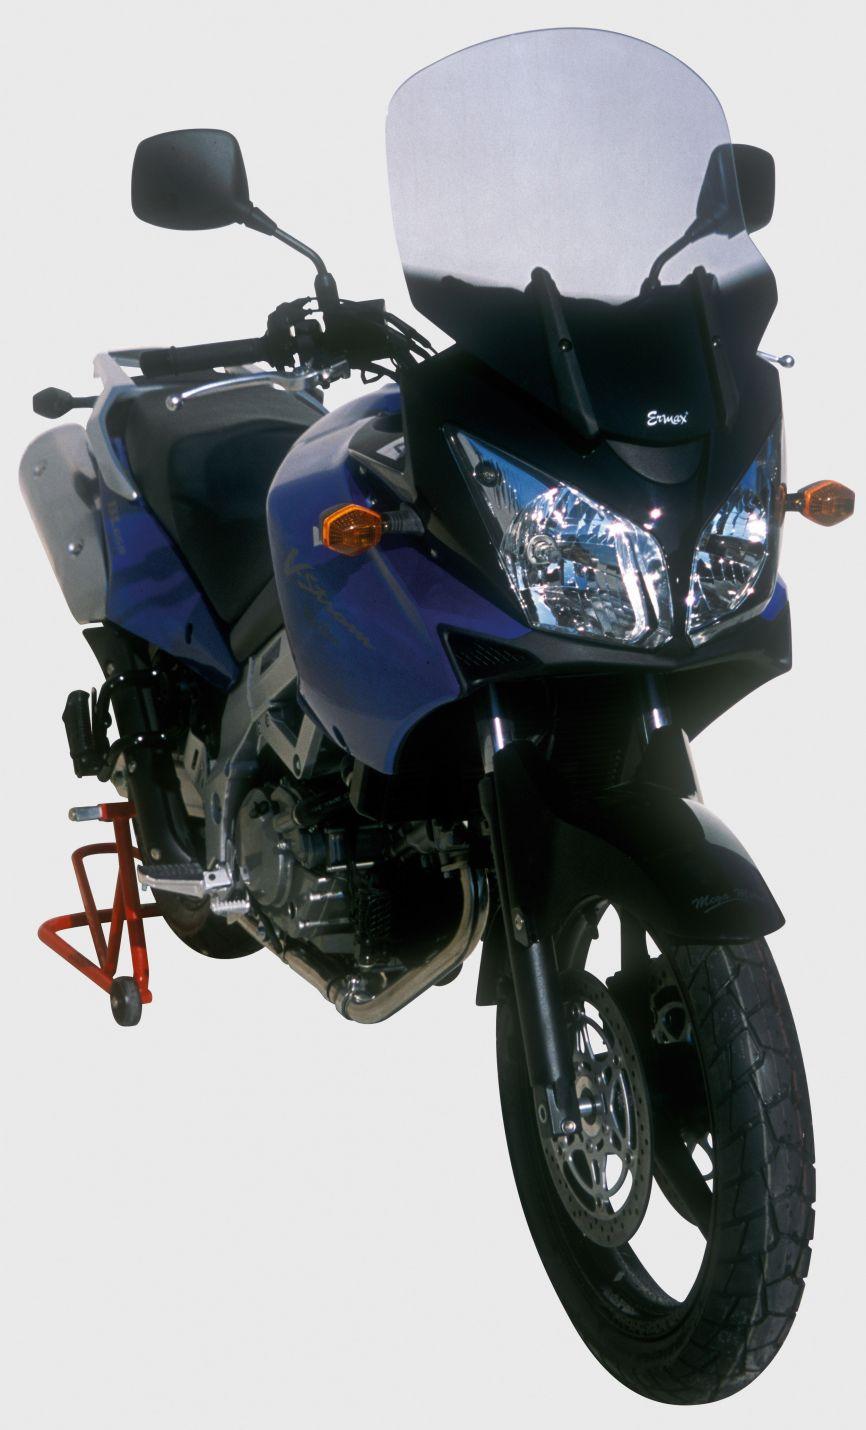 high protection windshield ermax for DL 650 v   STROM 2004-2011